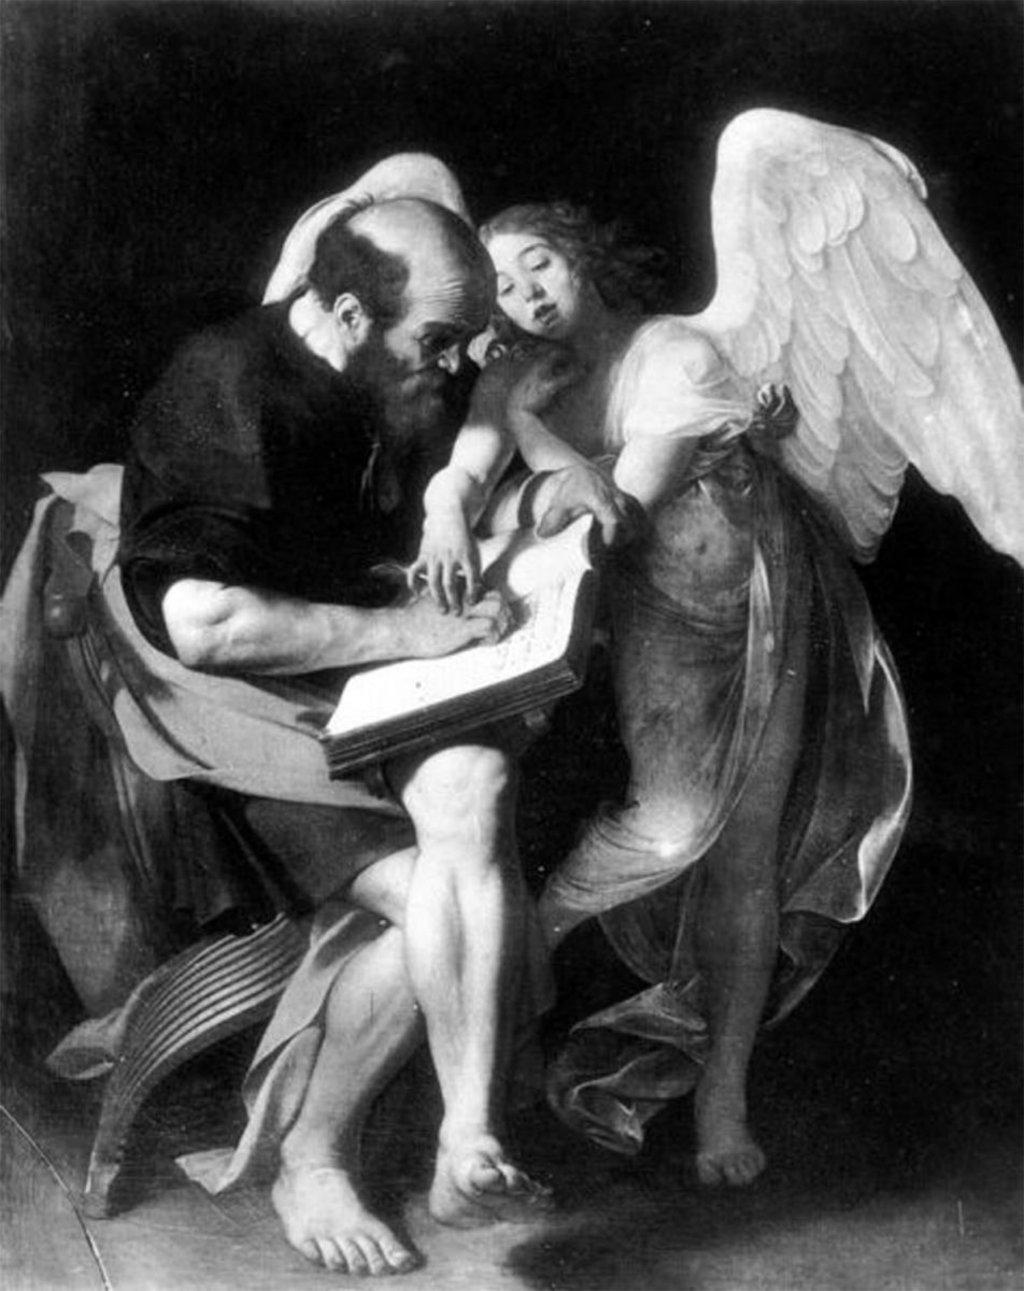 Caravaggio, San Matteo e l'angelo, 1602, già Berlino, Kaiser Friedrich Museum (Wikimedia Commons -  https://upload.wikimedia.org/wikipedia/commons/8/88/San_Matteo_e_l%27angelo.jpg)